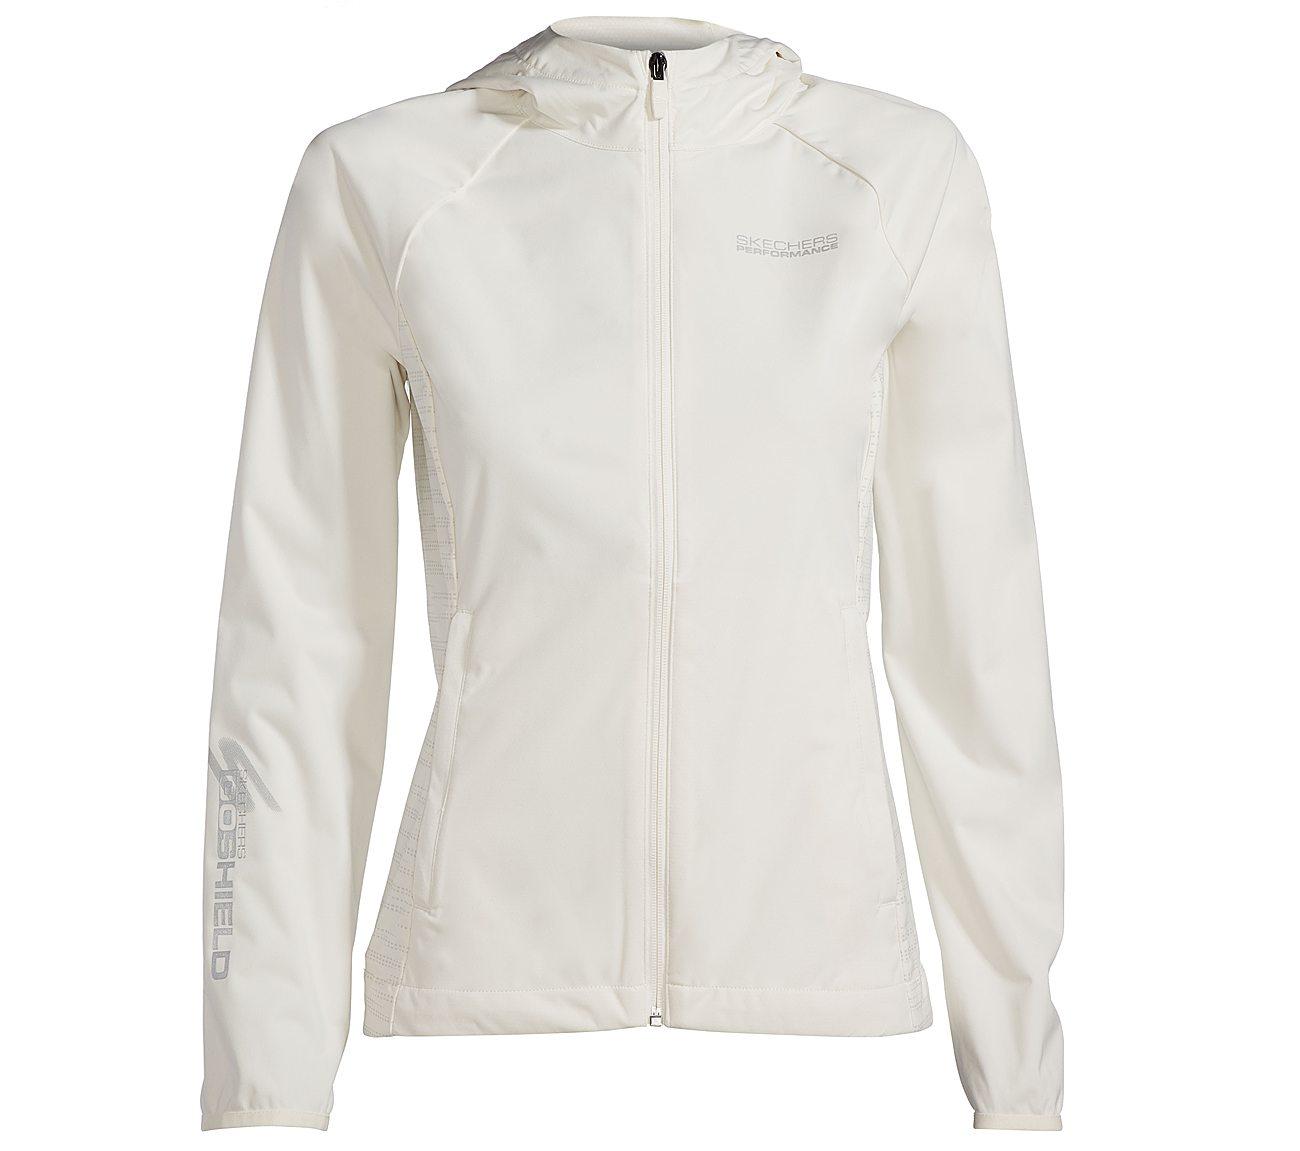 SKECHERS GOShield LX932 Jacket